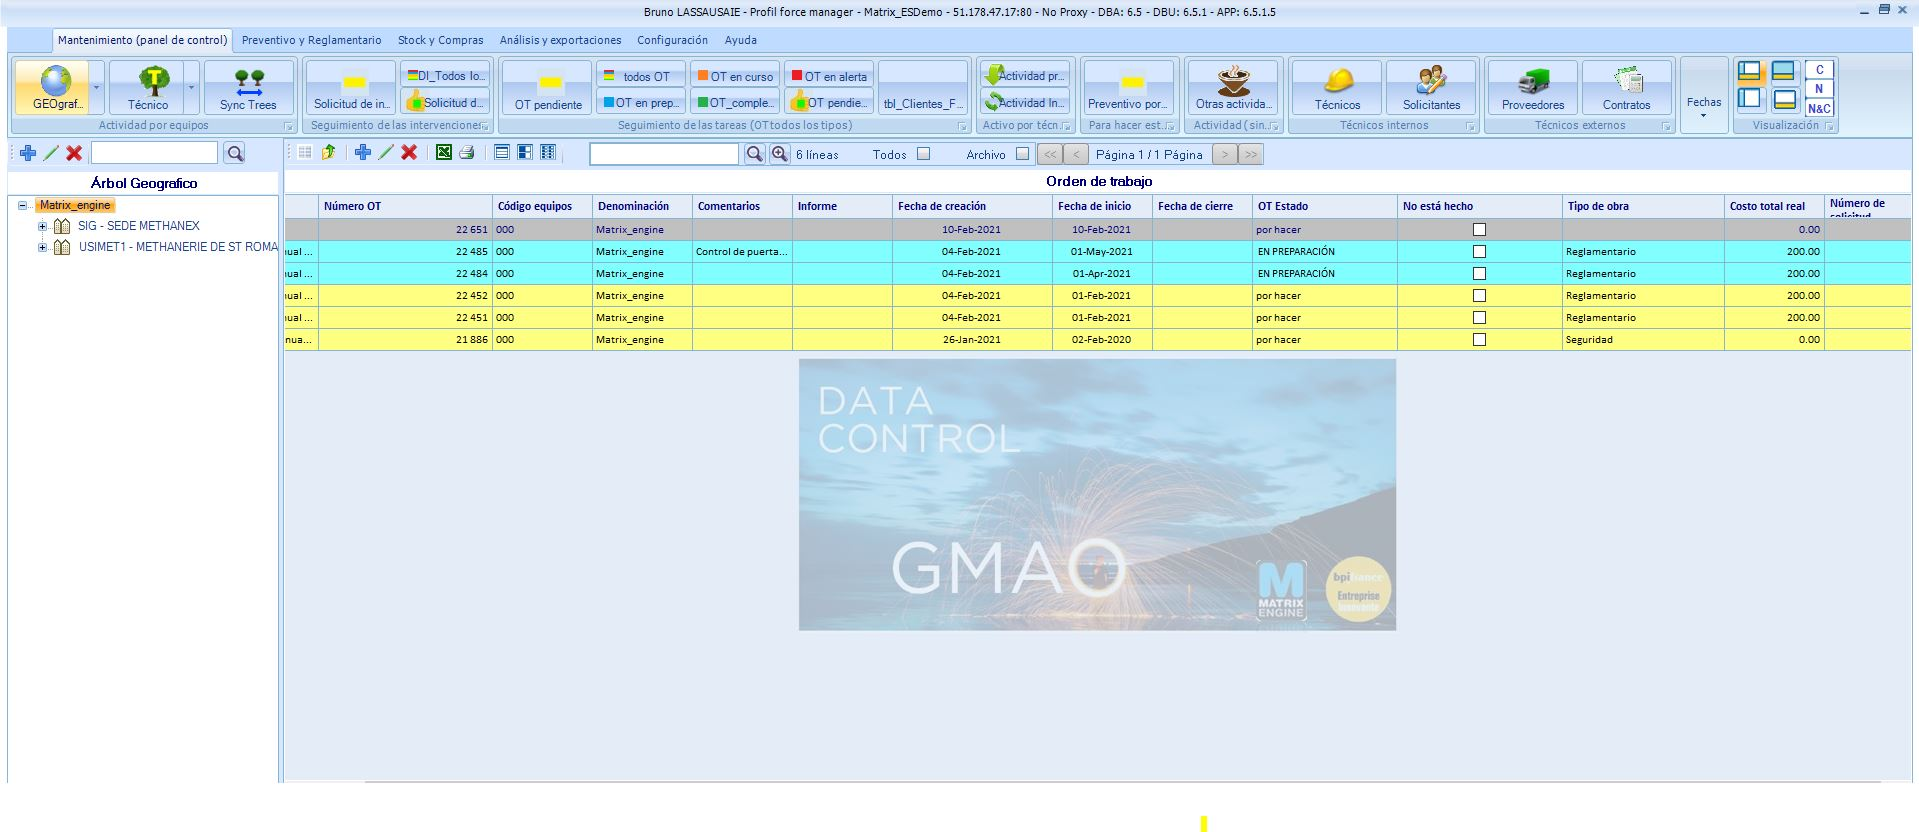 Matrix Engine GMAO screenshot: Visualización de la plataforma